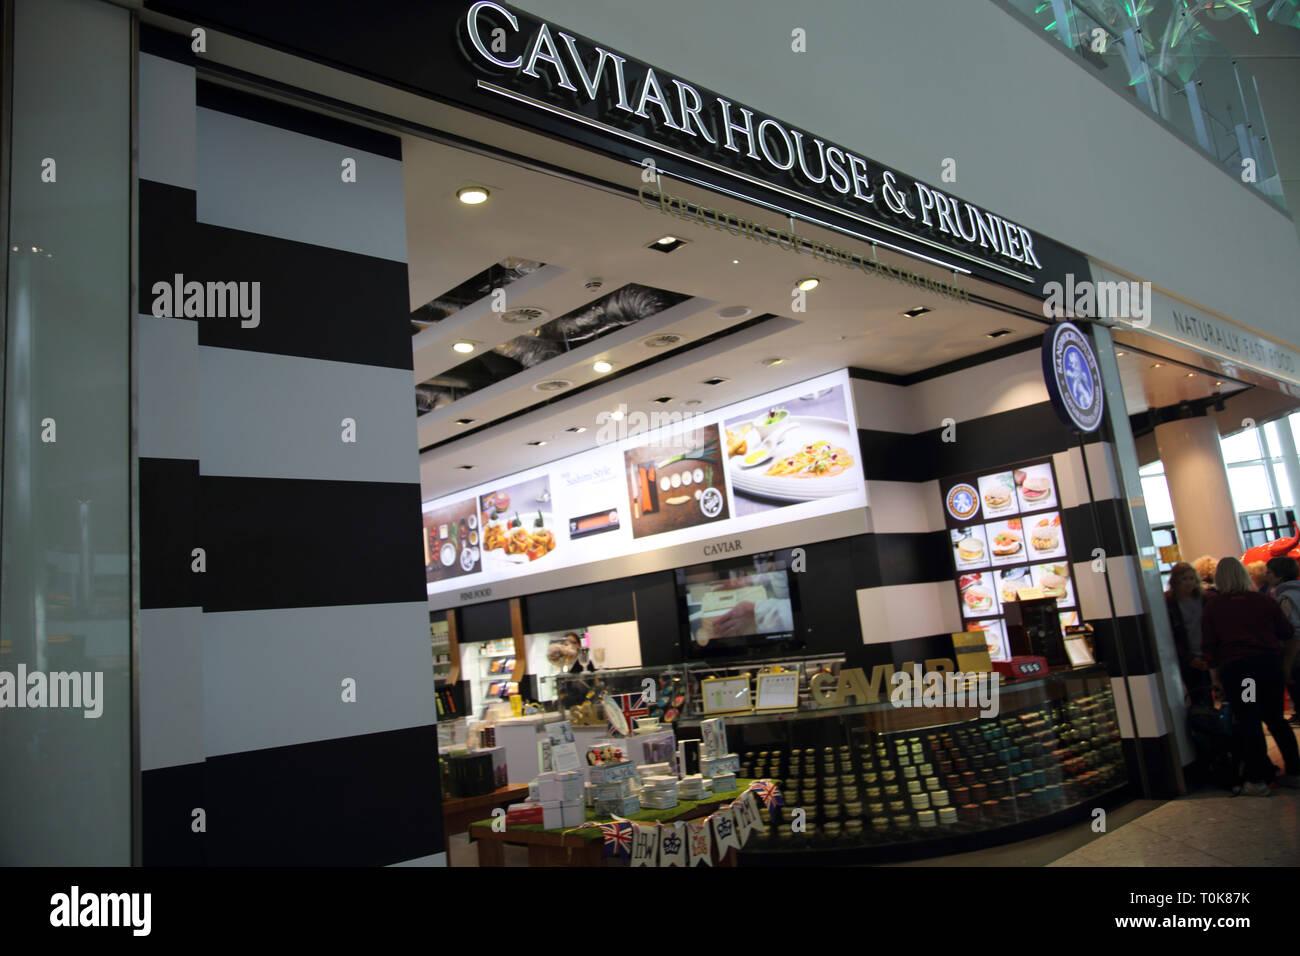 England Heathrow Airport Terminal Two Caviar House and Prunier Seafood Bar - Stock Image